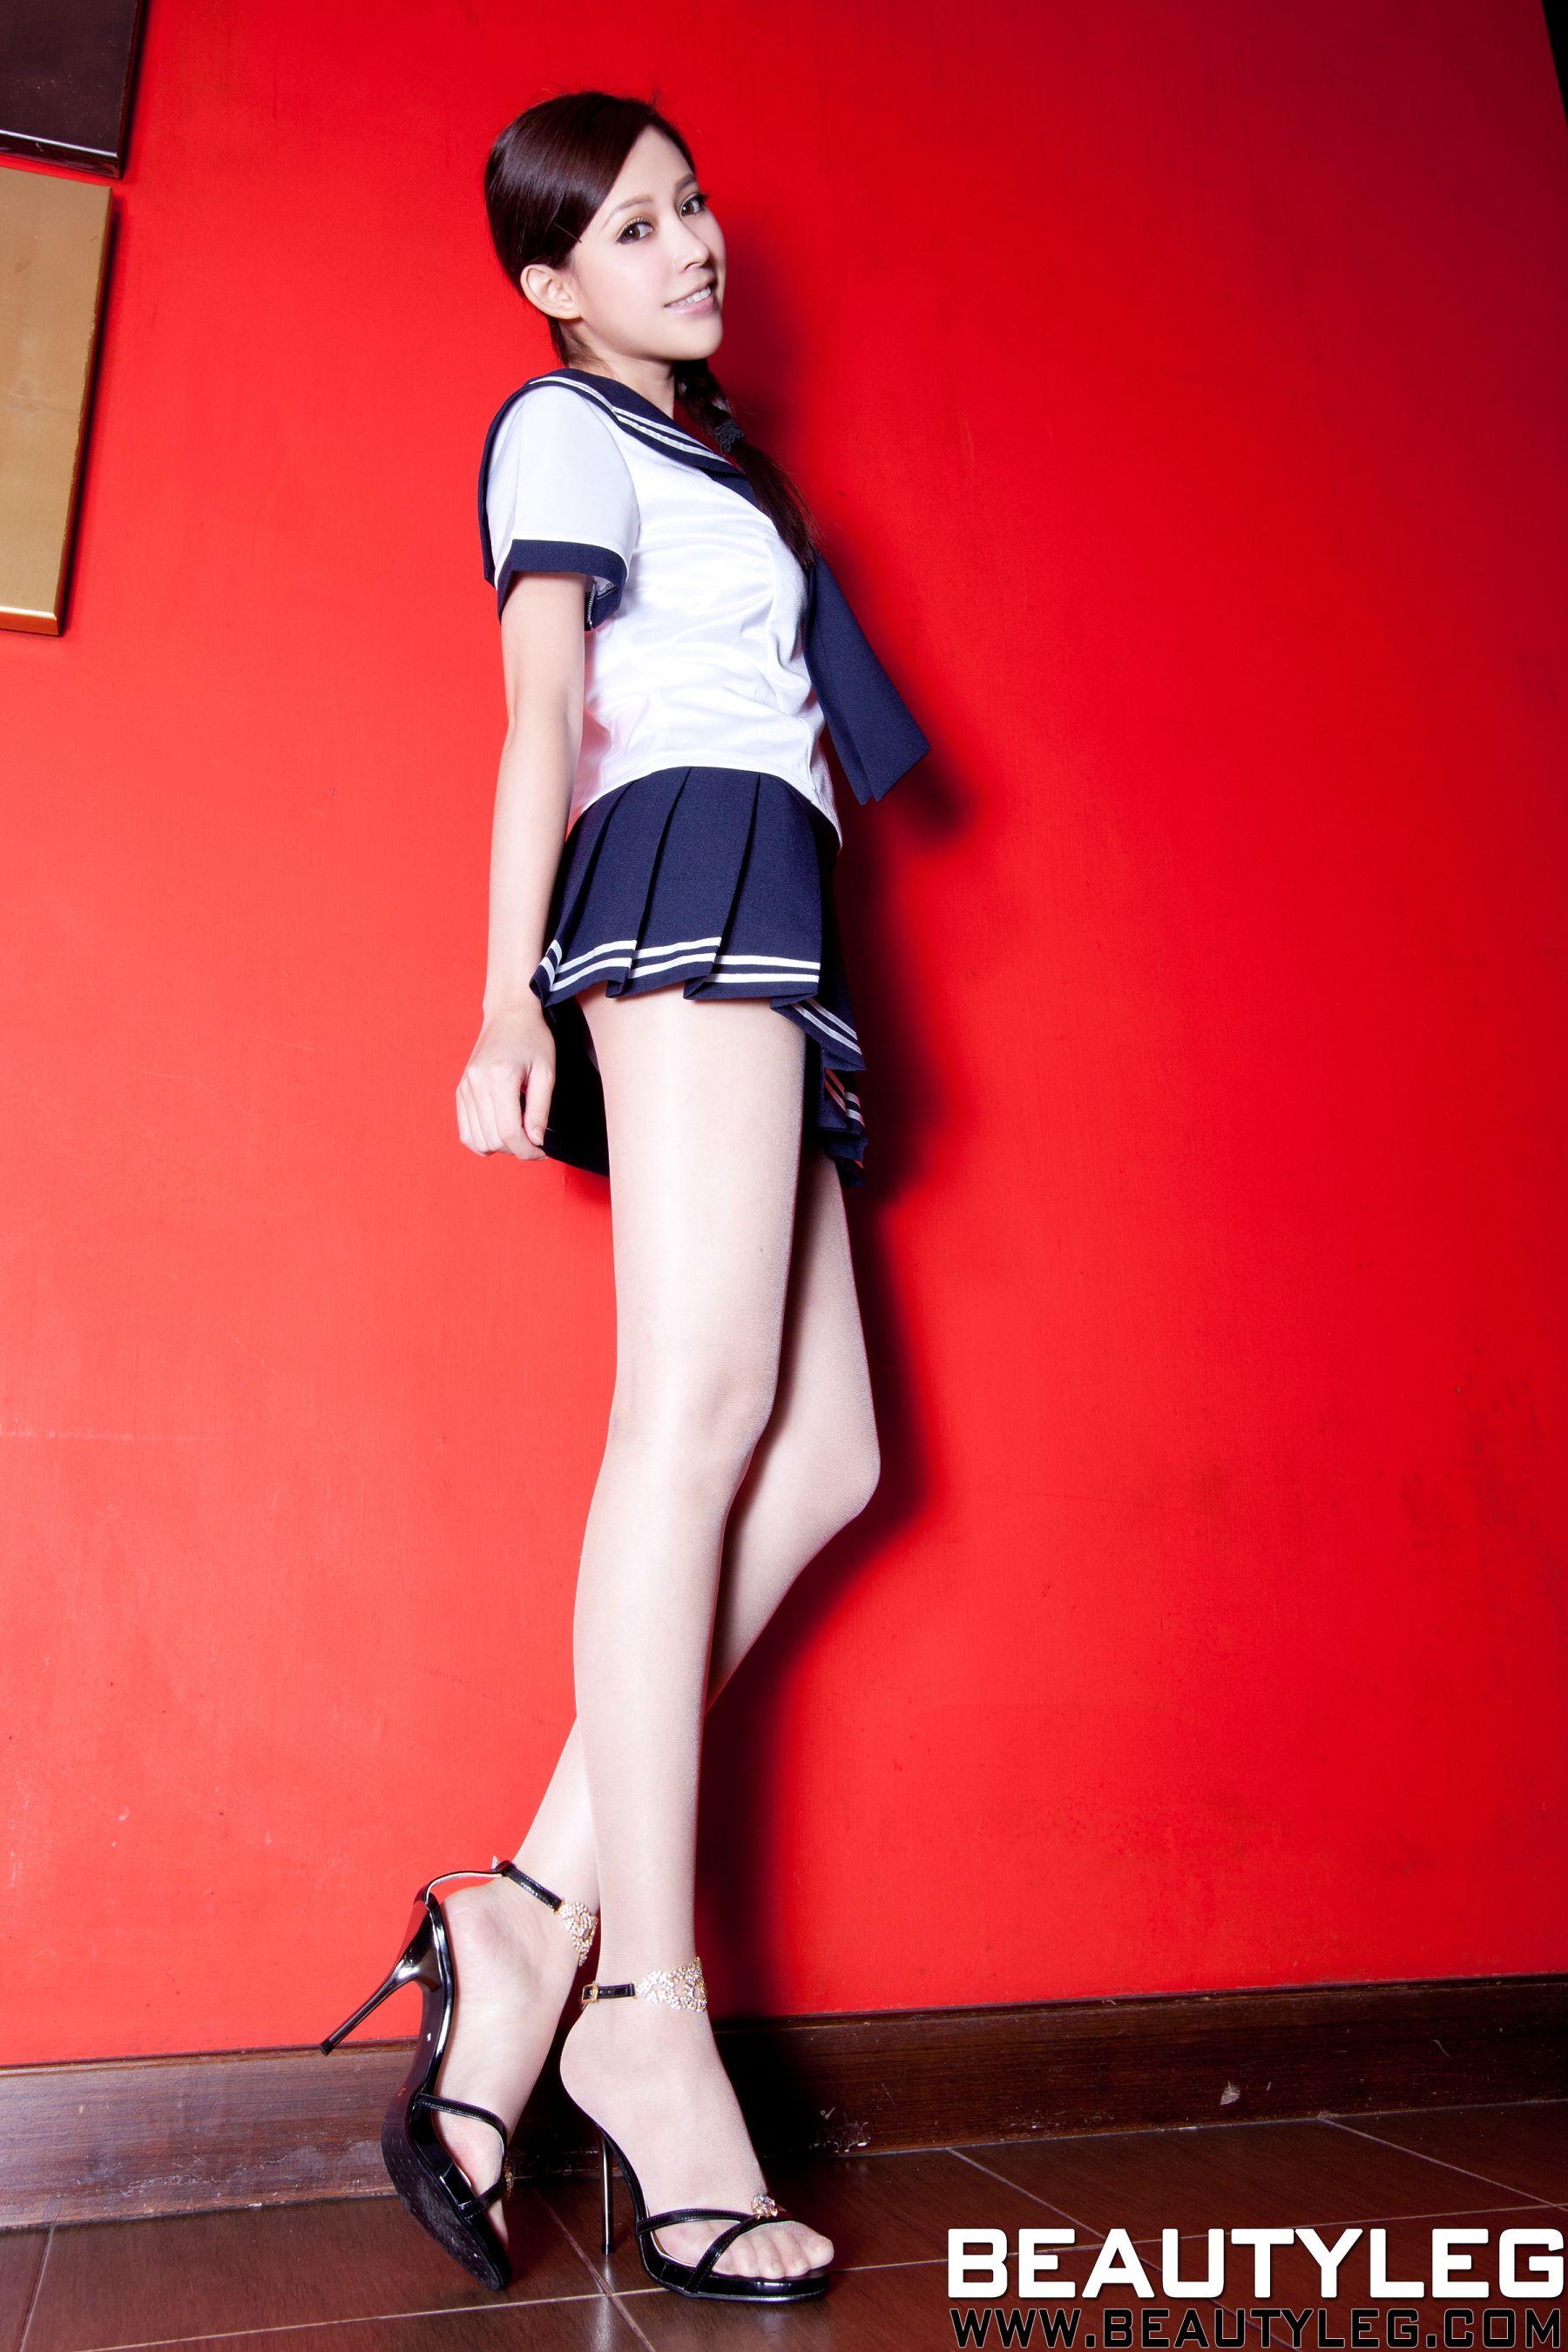 VOL.1173 [Beautyleg]高跟凉鞋长腿美女:杜可薇(腿模Avy,恬小鱼)高品质写真套图(87P)